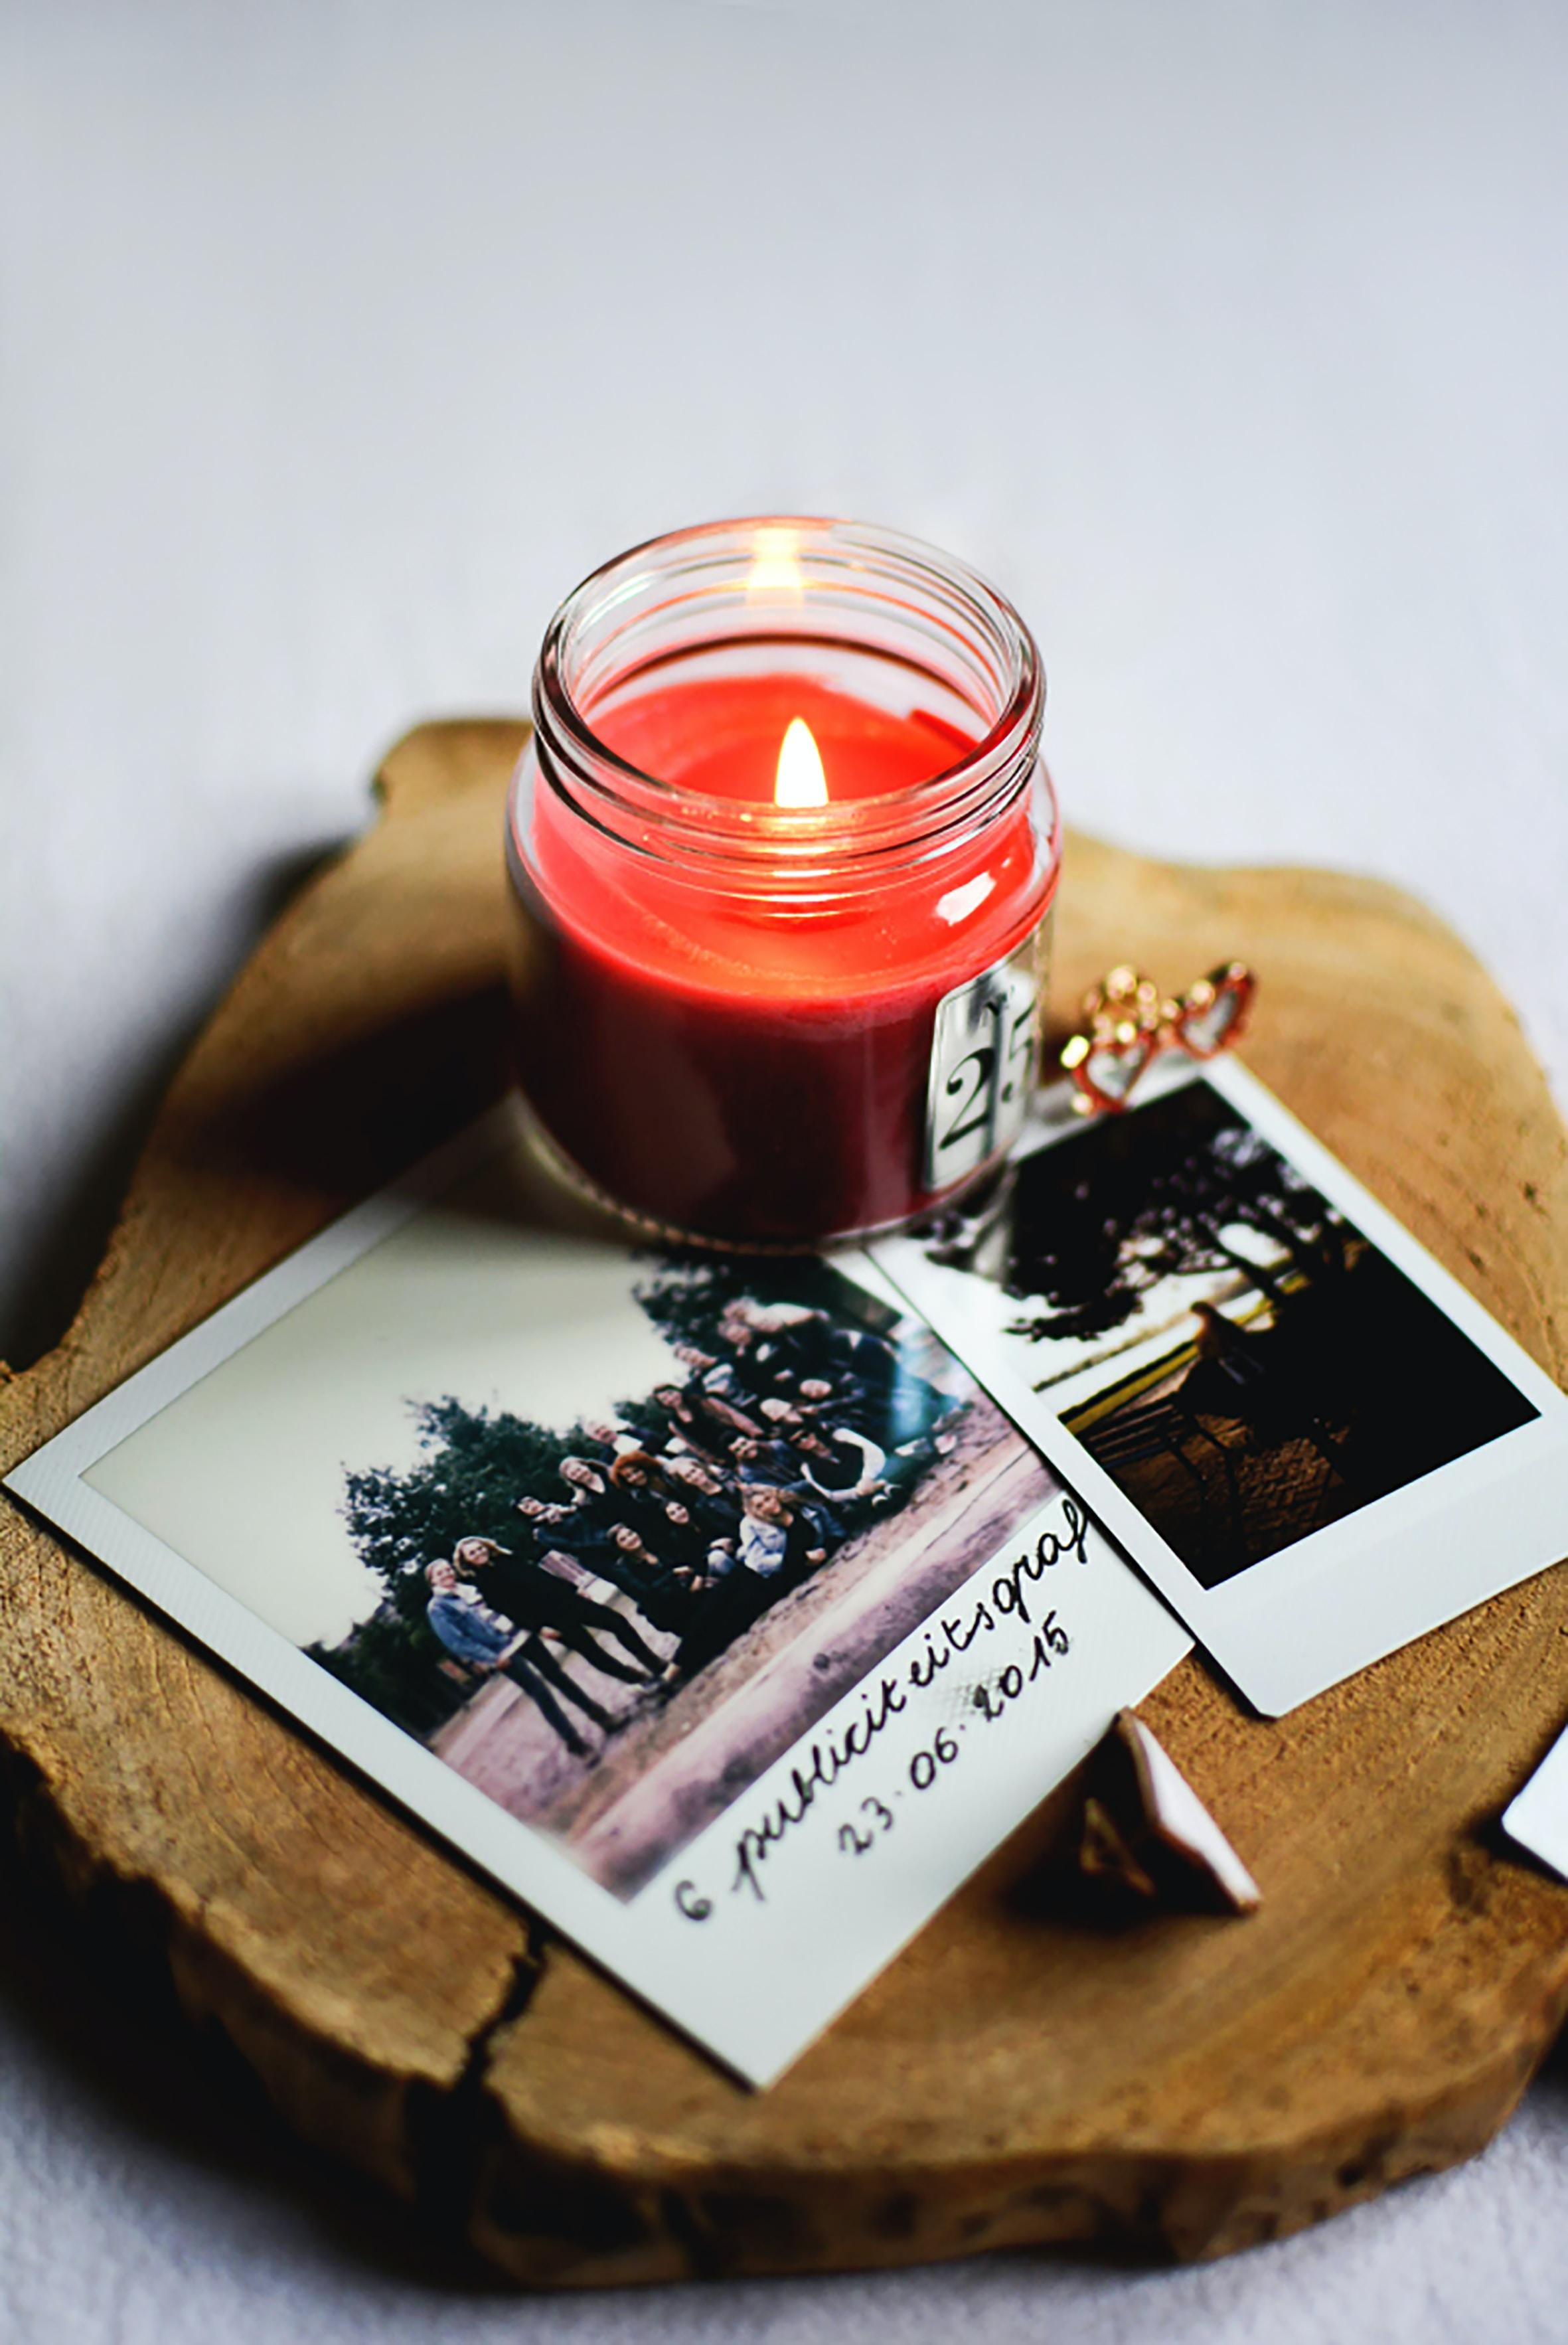 Bild: Fotos mit Kerze